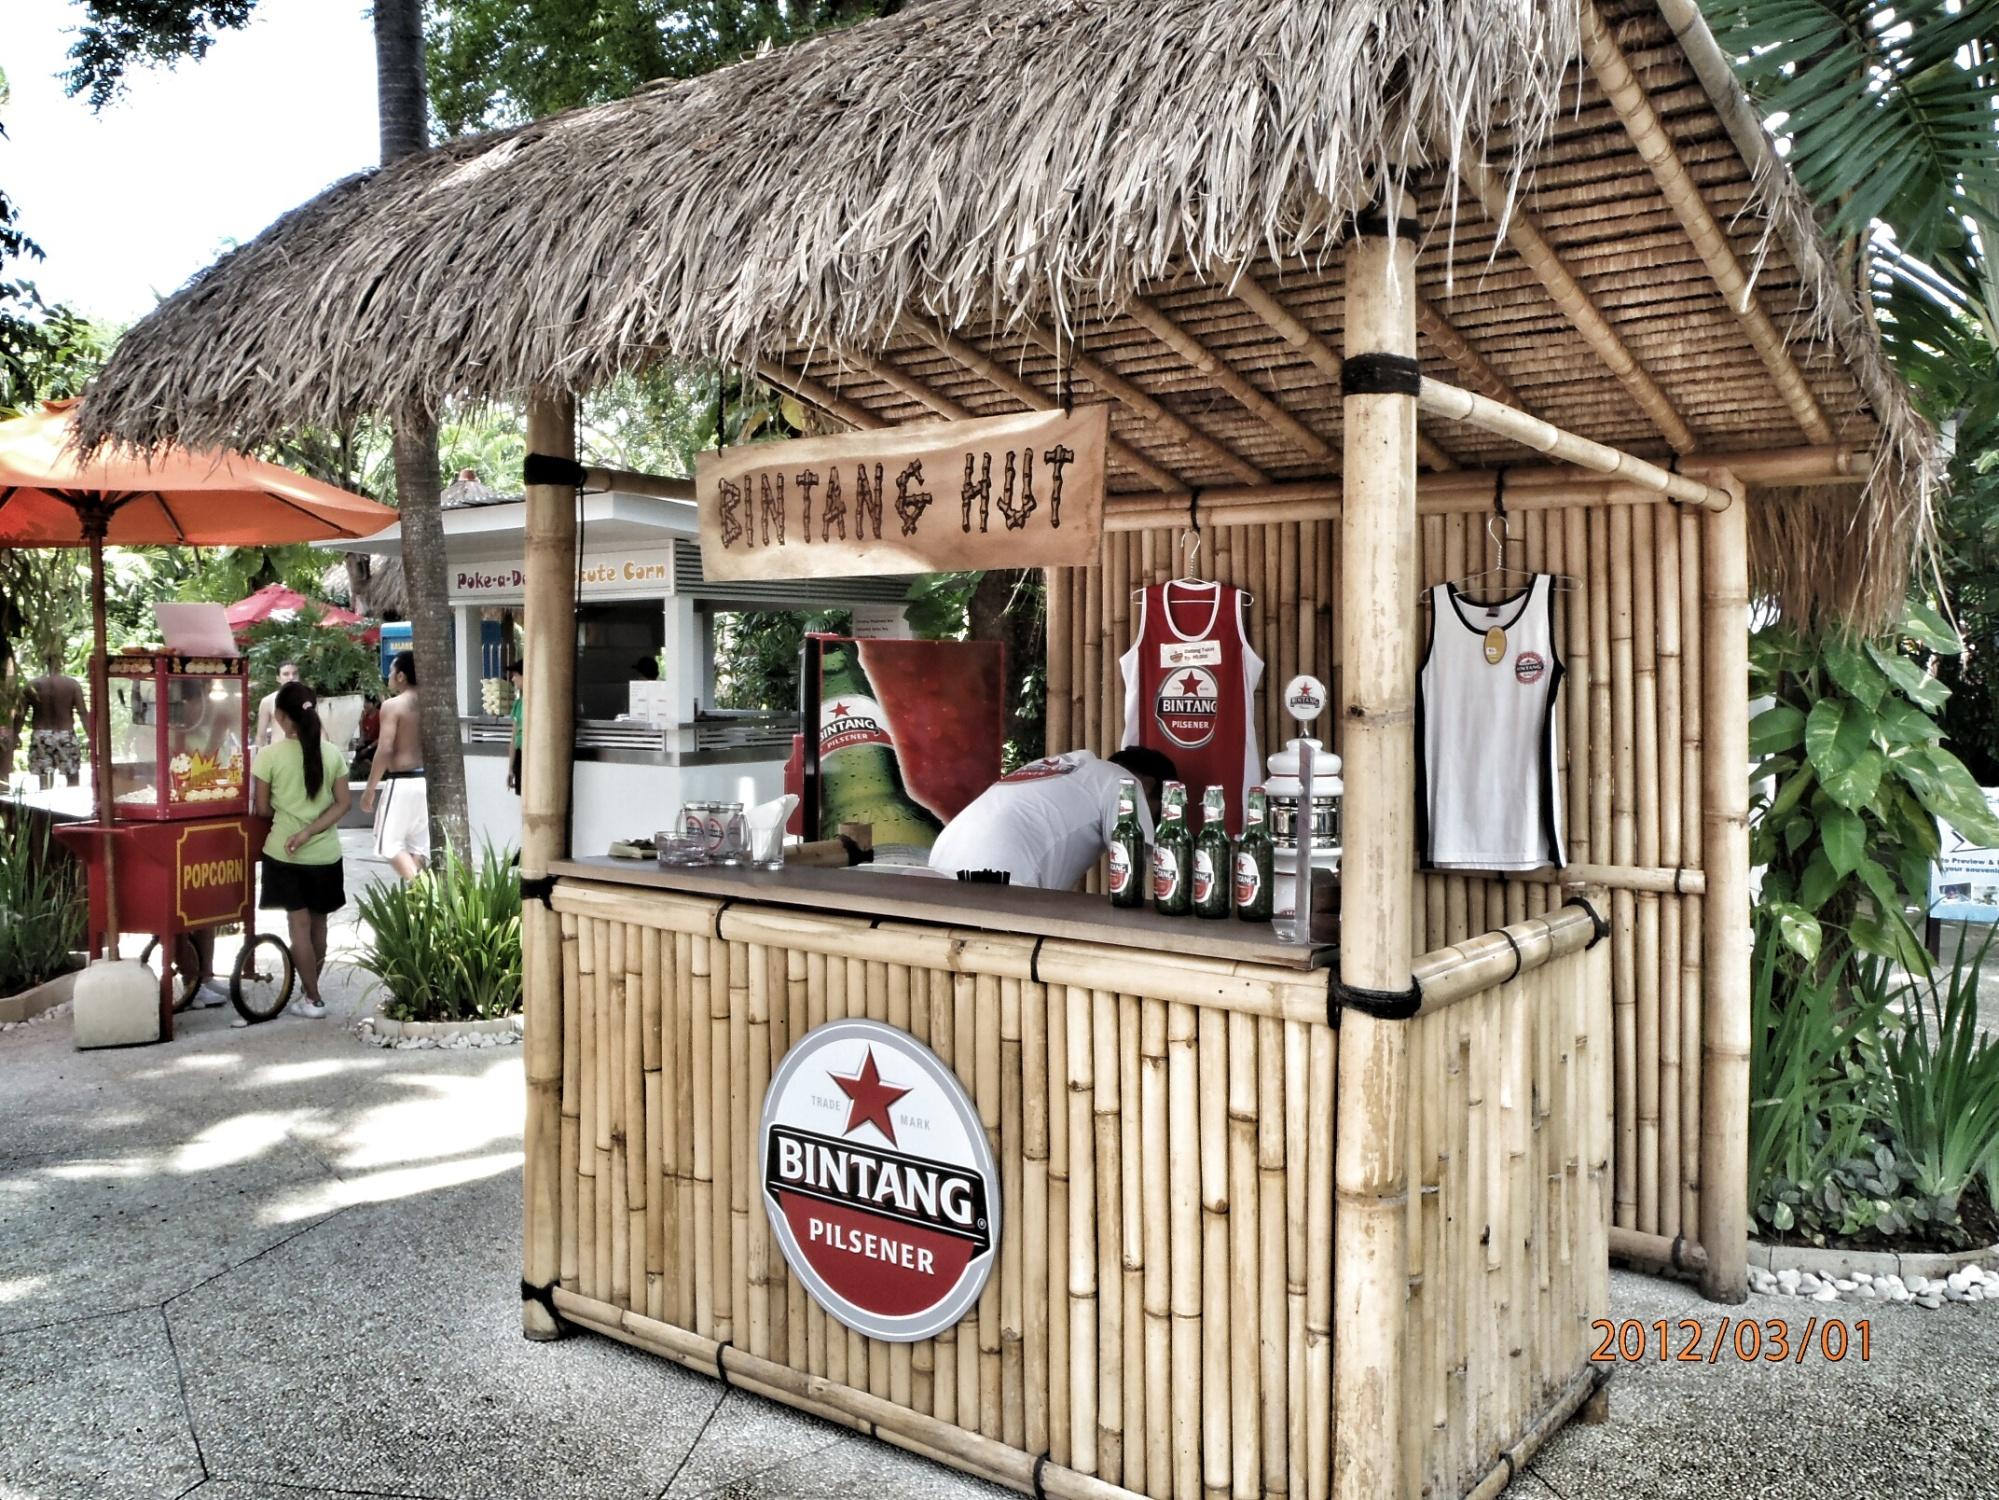 Bintang Hut in Bali